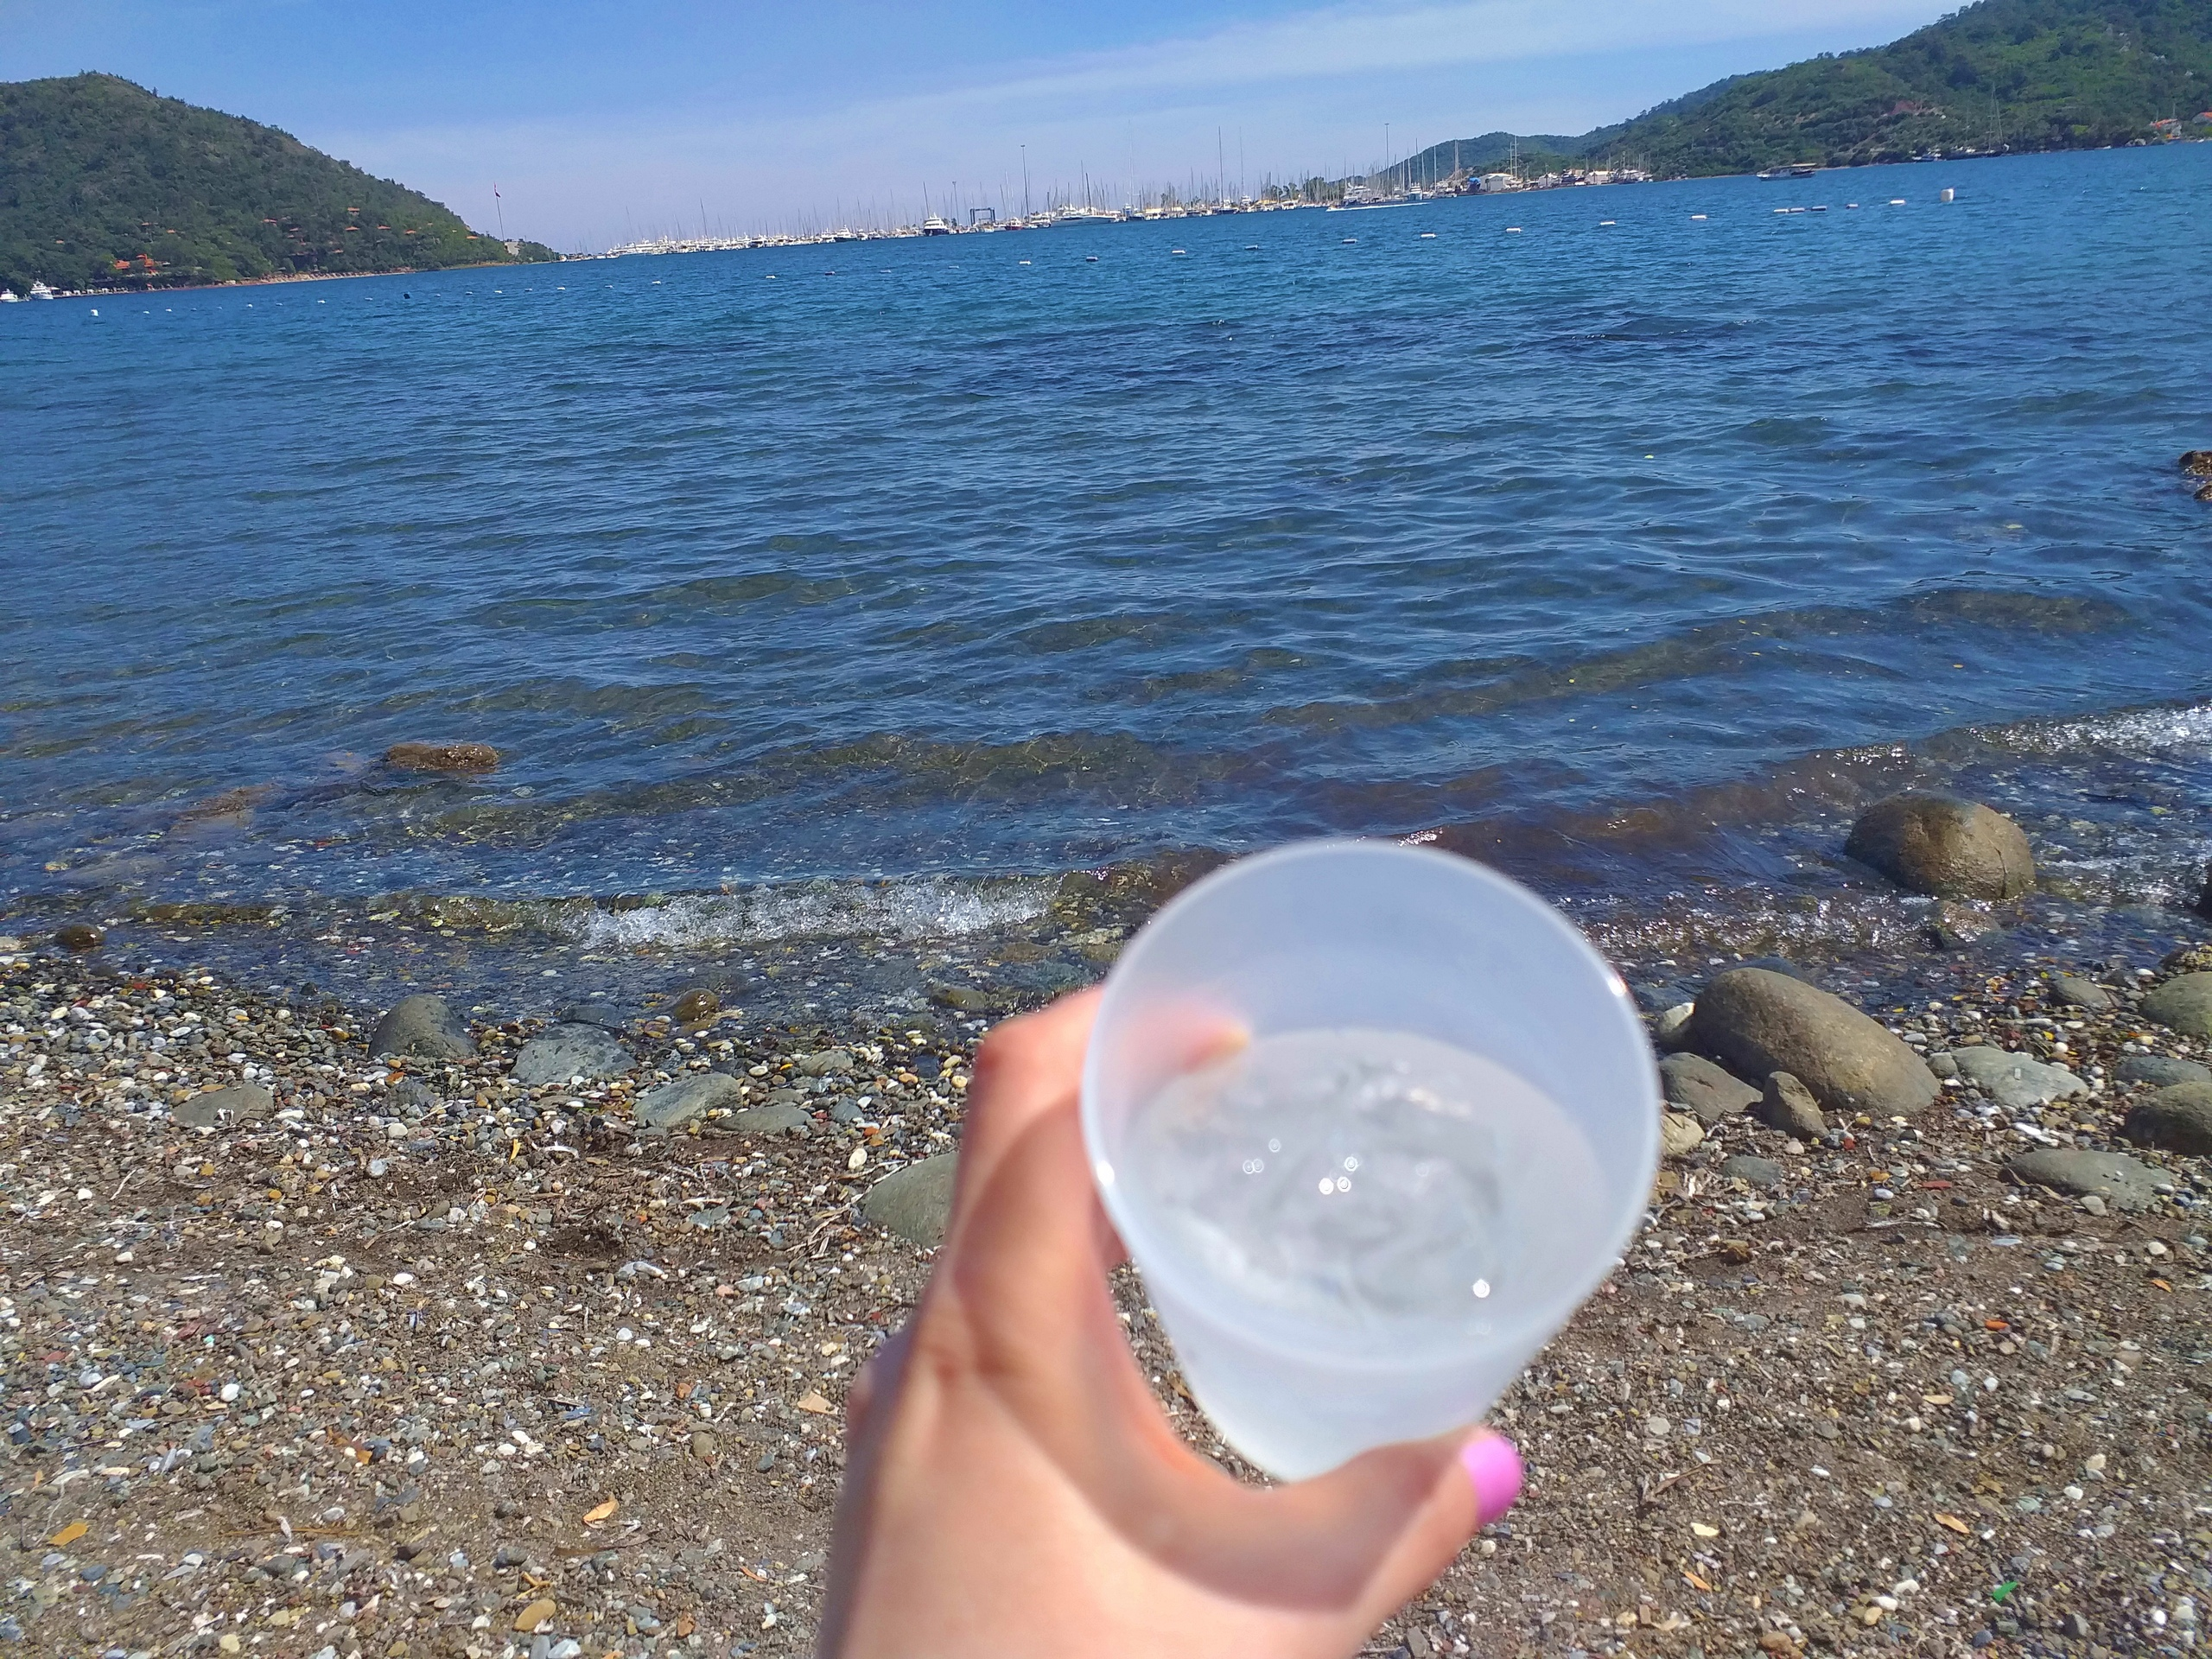 Елена Руденко ( Валтея). Мои путешествия. Турция. Мармарис. (фото ). OtC5zFs2Gz4